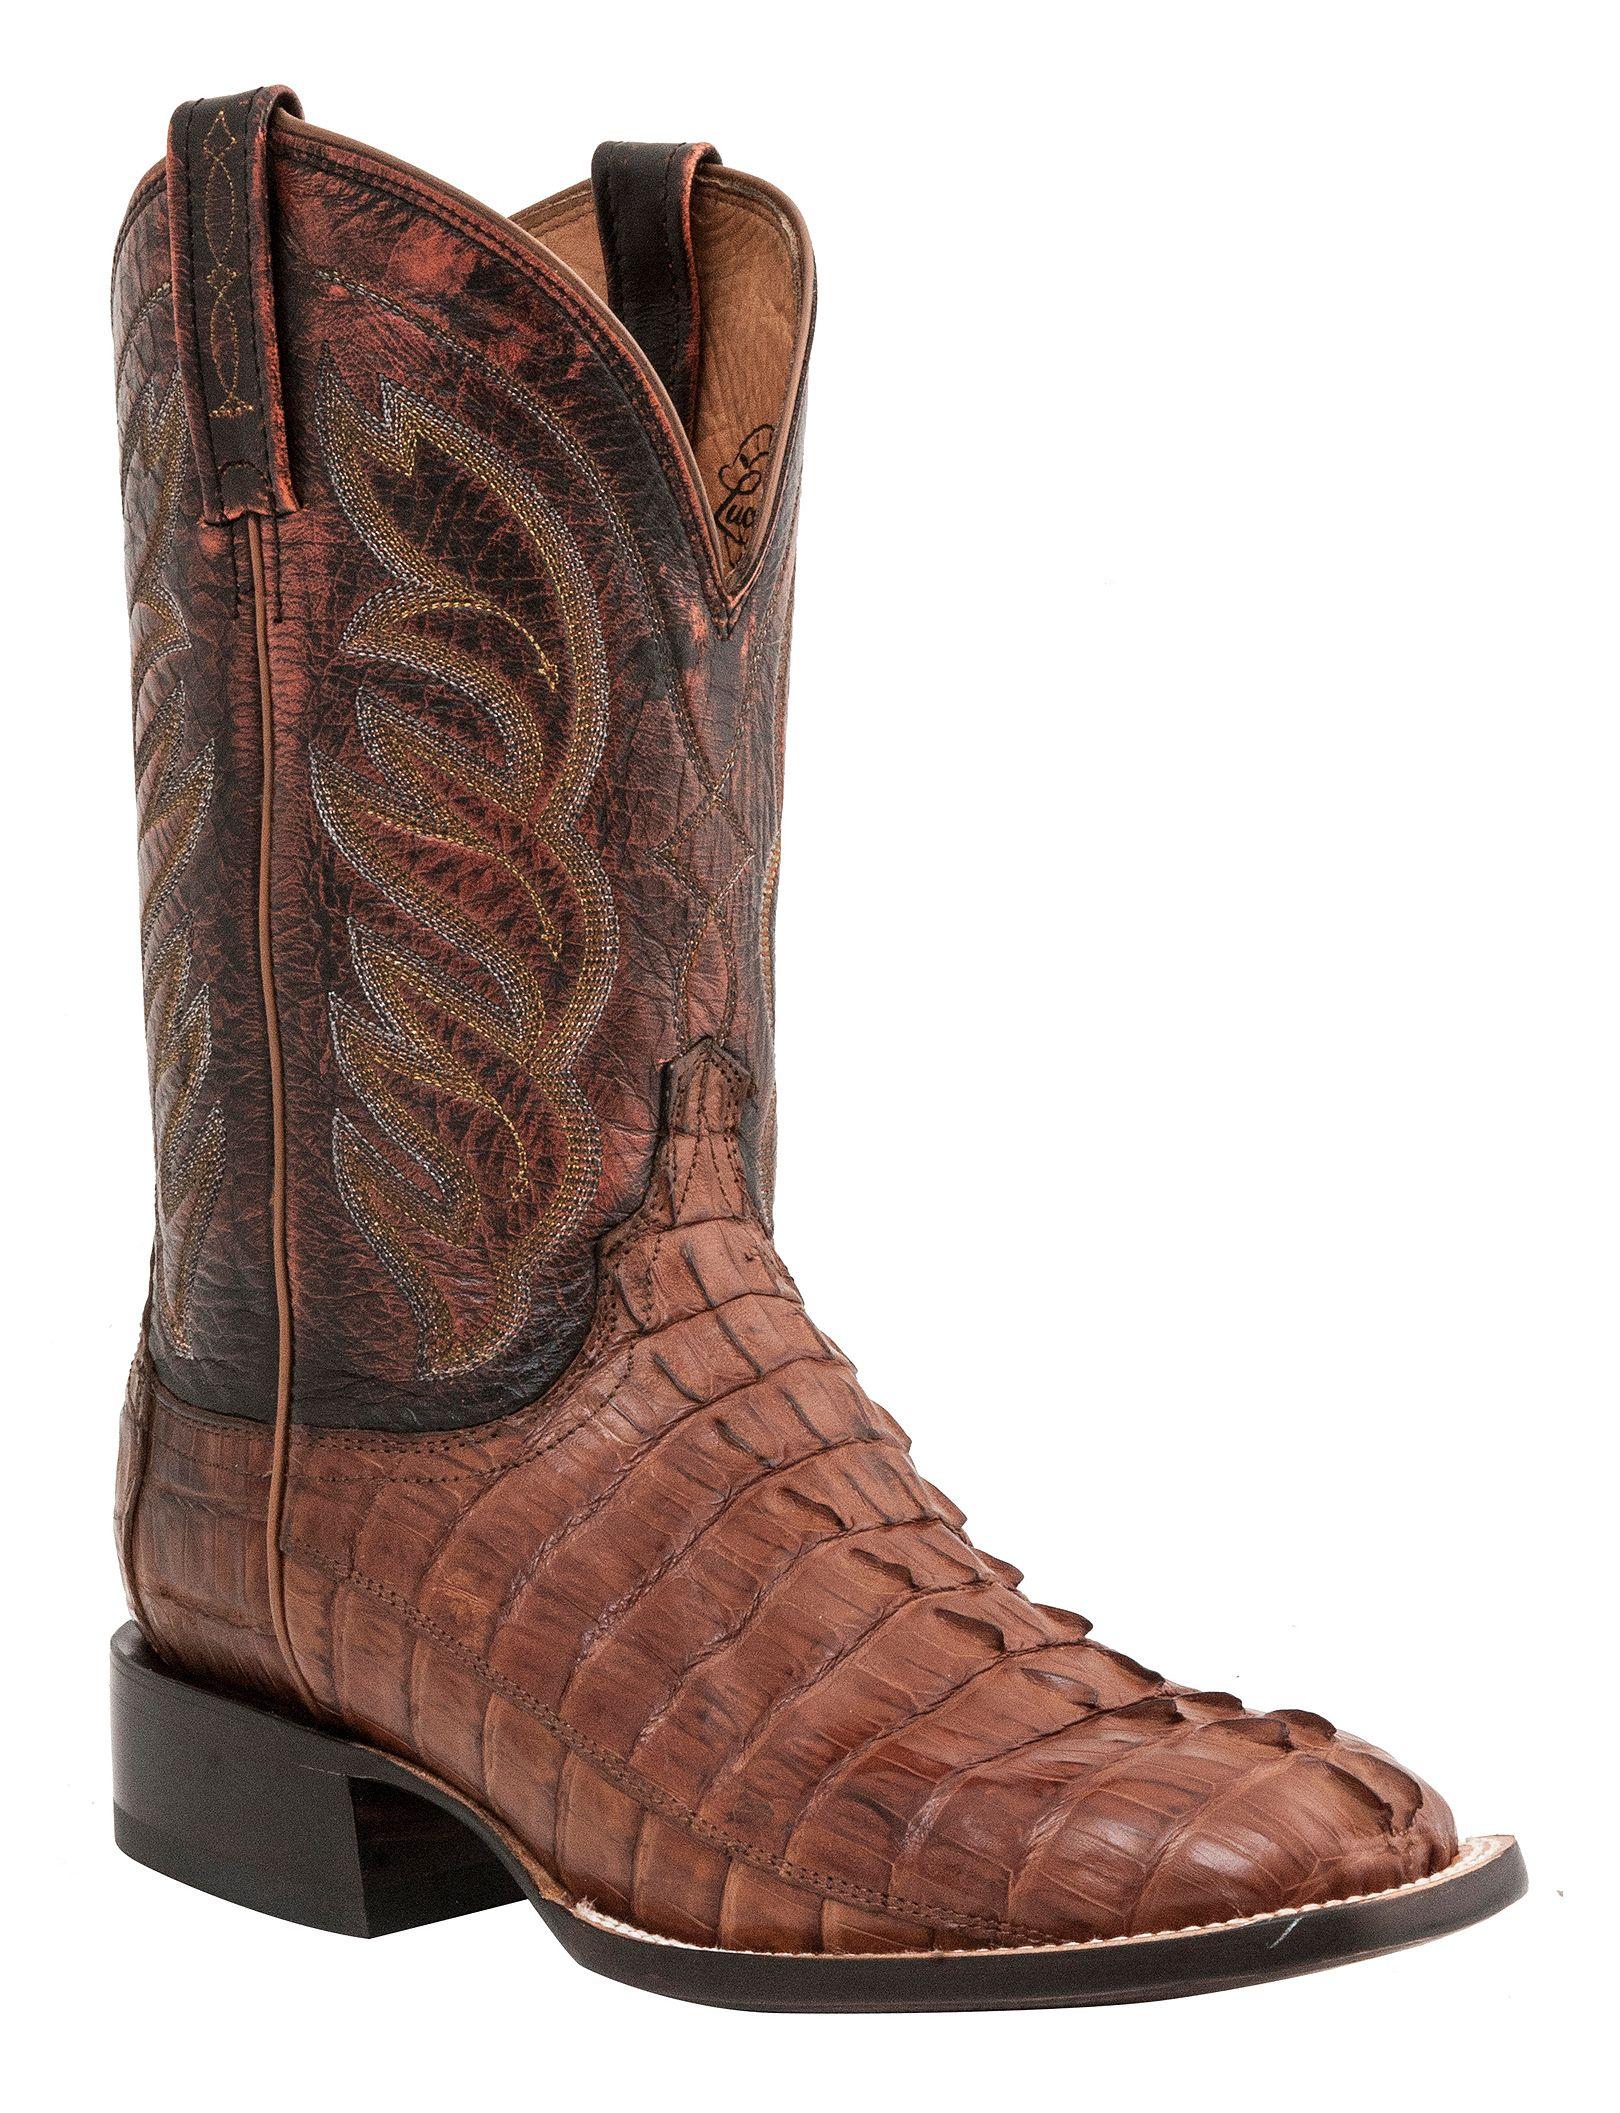 Lucchese 1883 Landon Hornback Caiman Tail Cowboy Boots